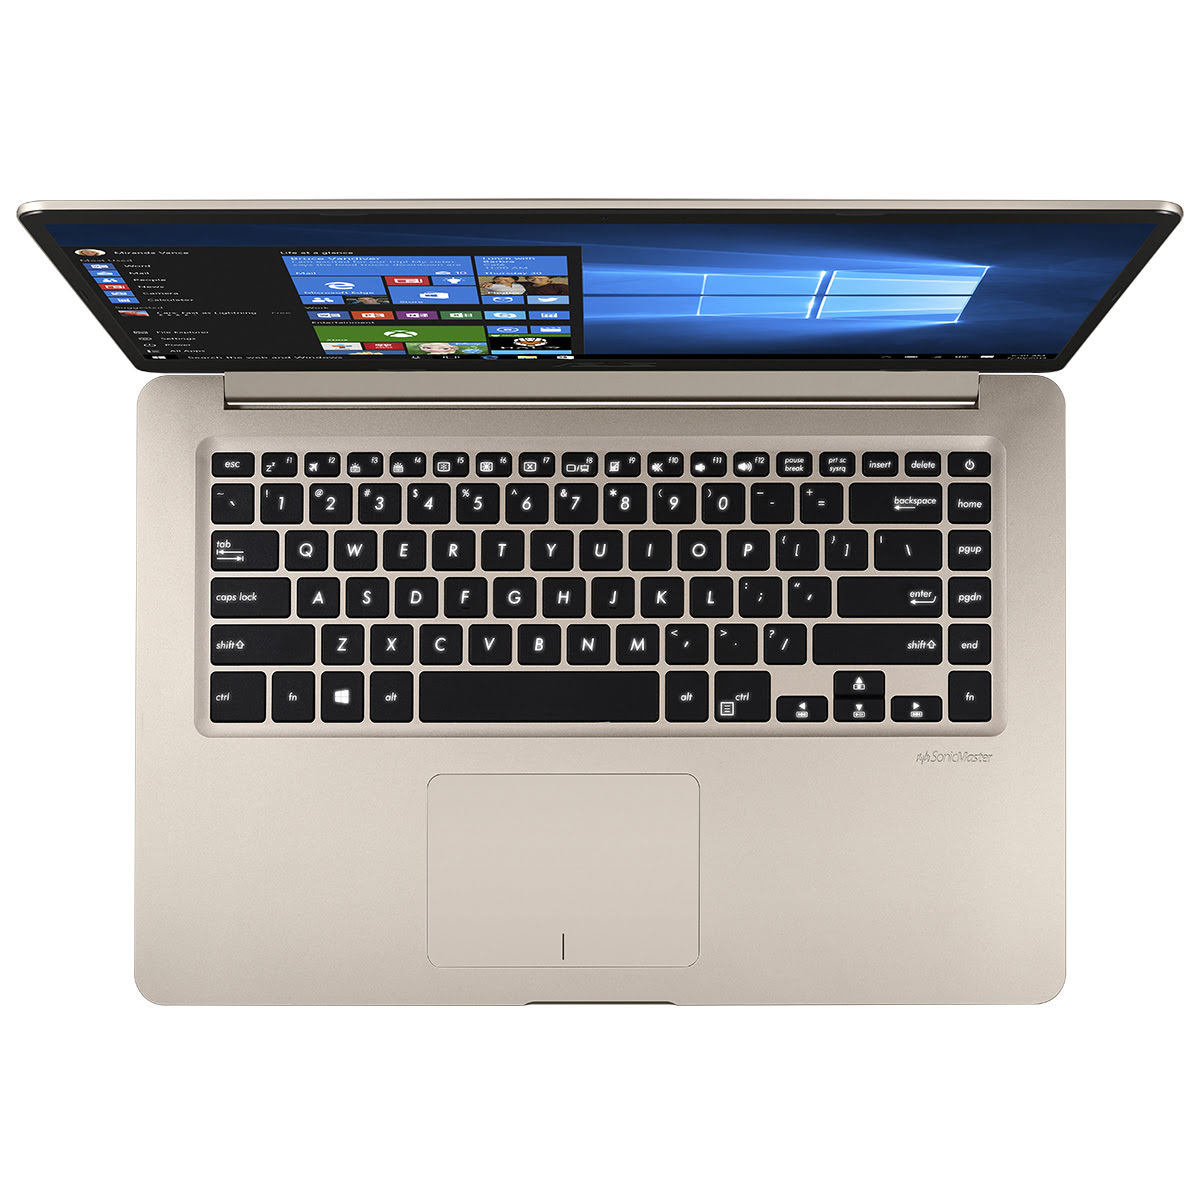 Asus 90NB0FQ5-M07070 - PC portable Asus - Cybertek.fr - 4